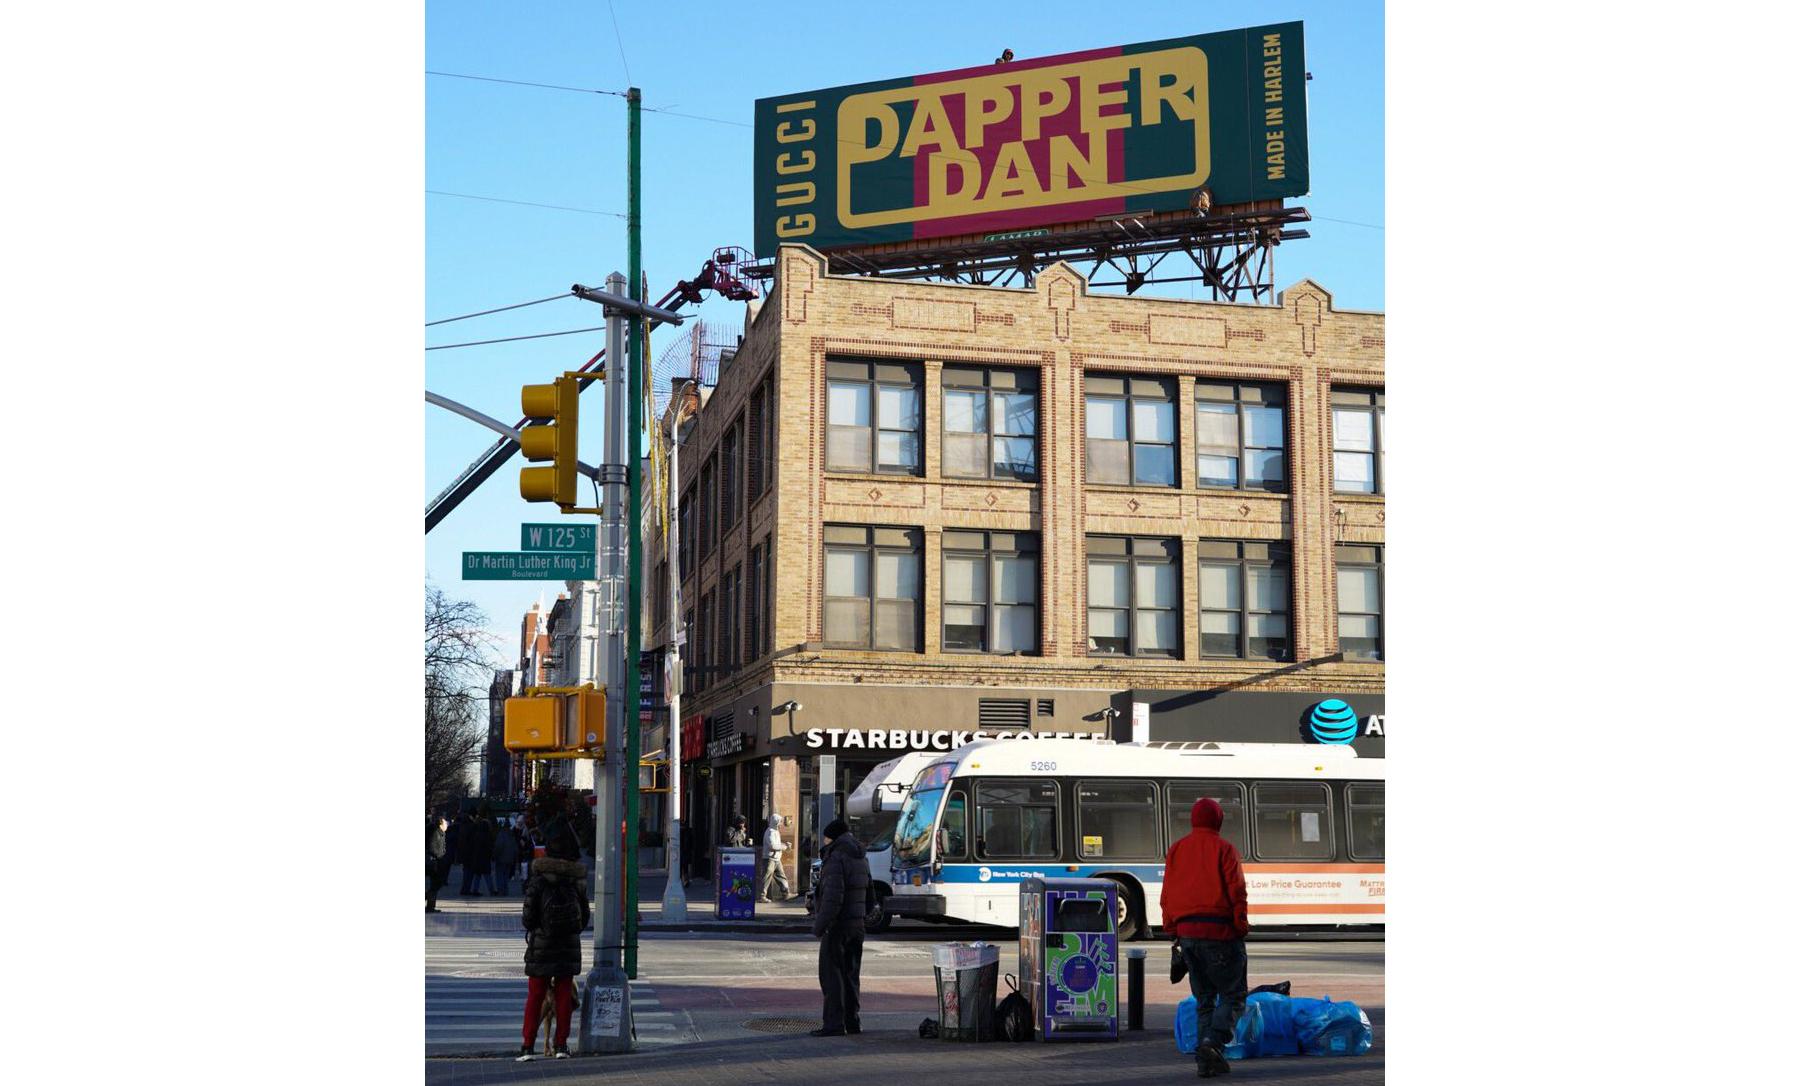 Dapper Dan 和 Gucci 联手在 Harlem 开设了一家高档精品店